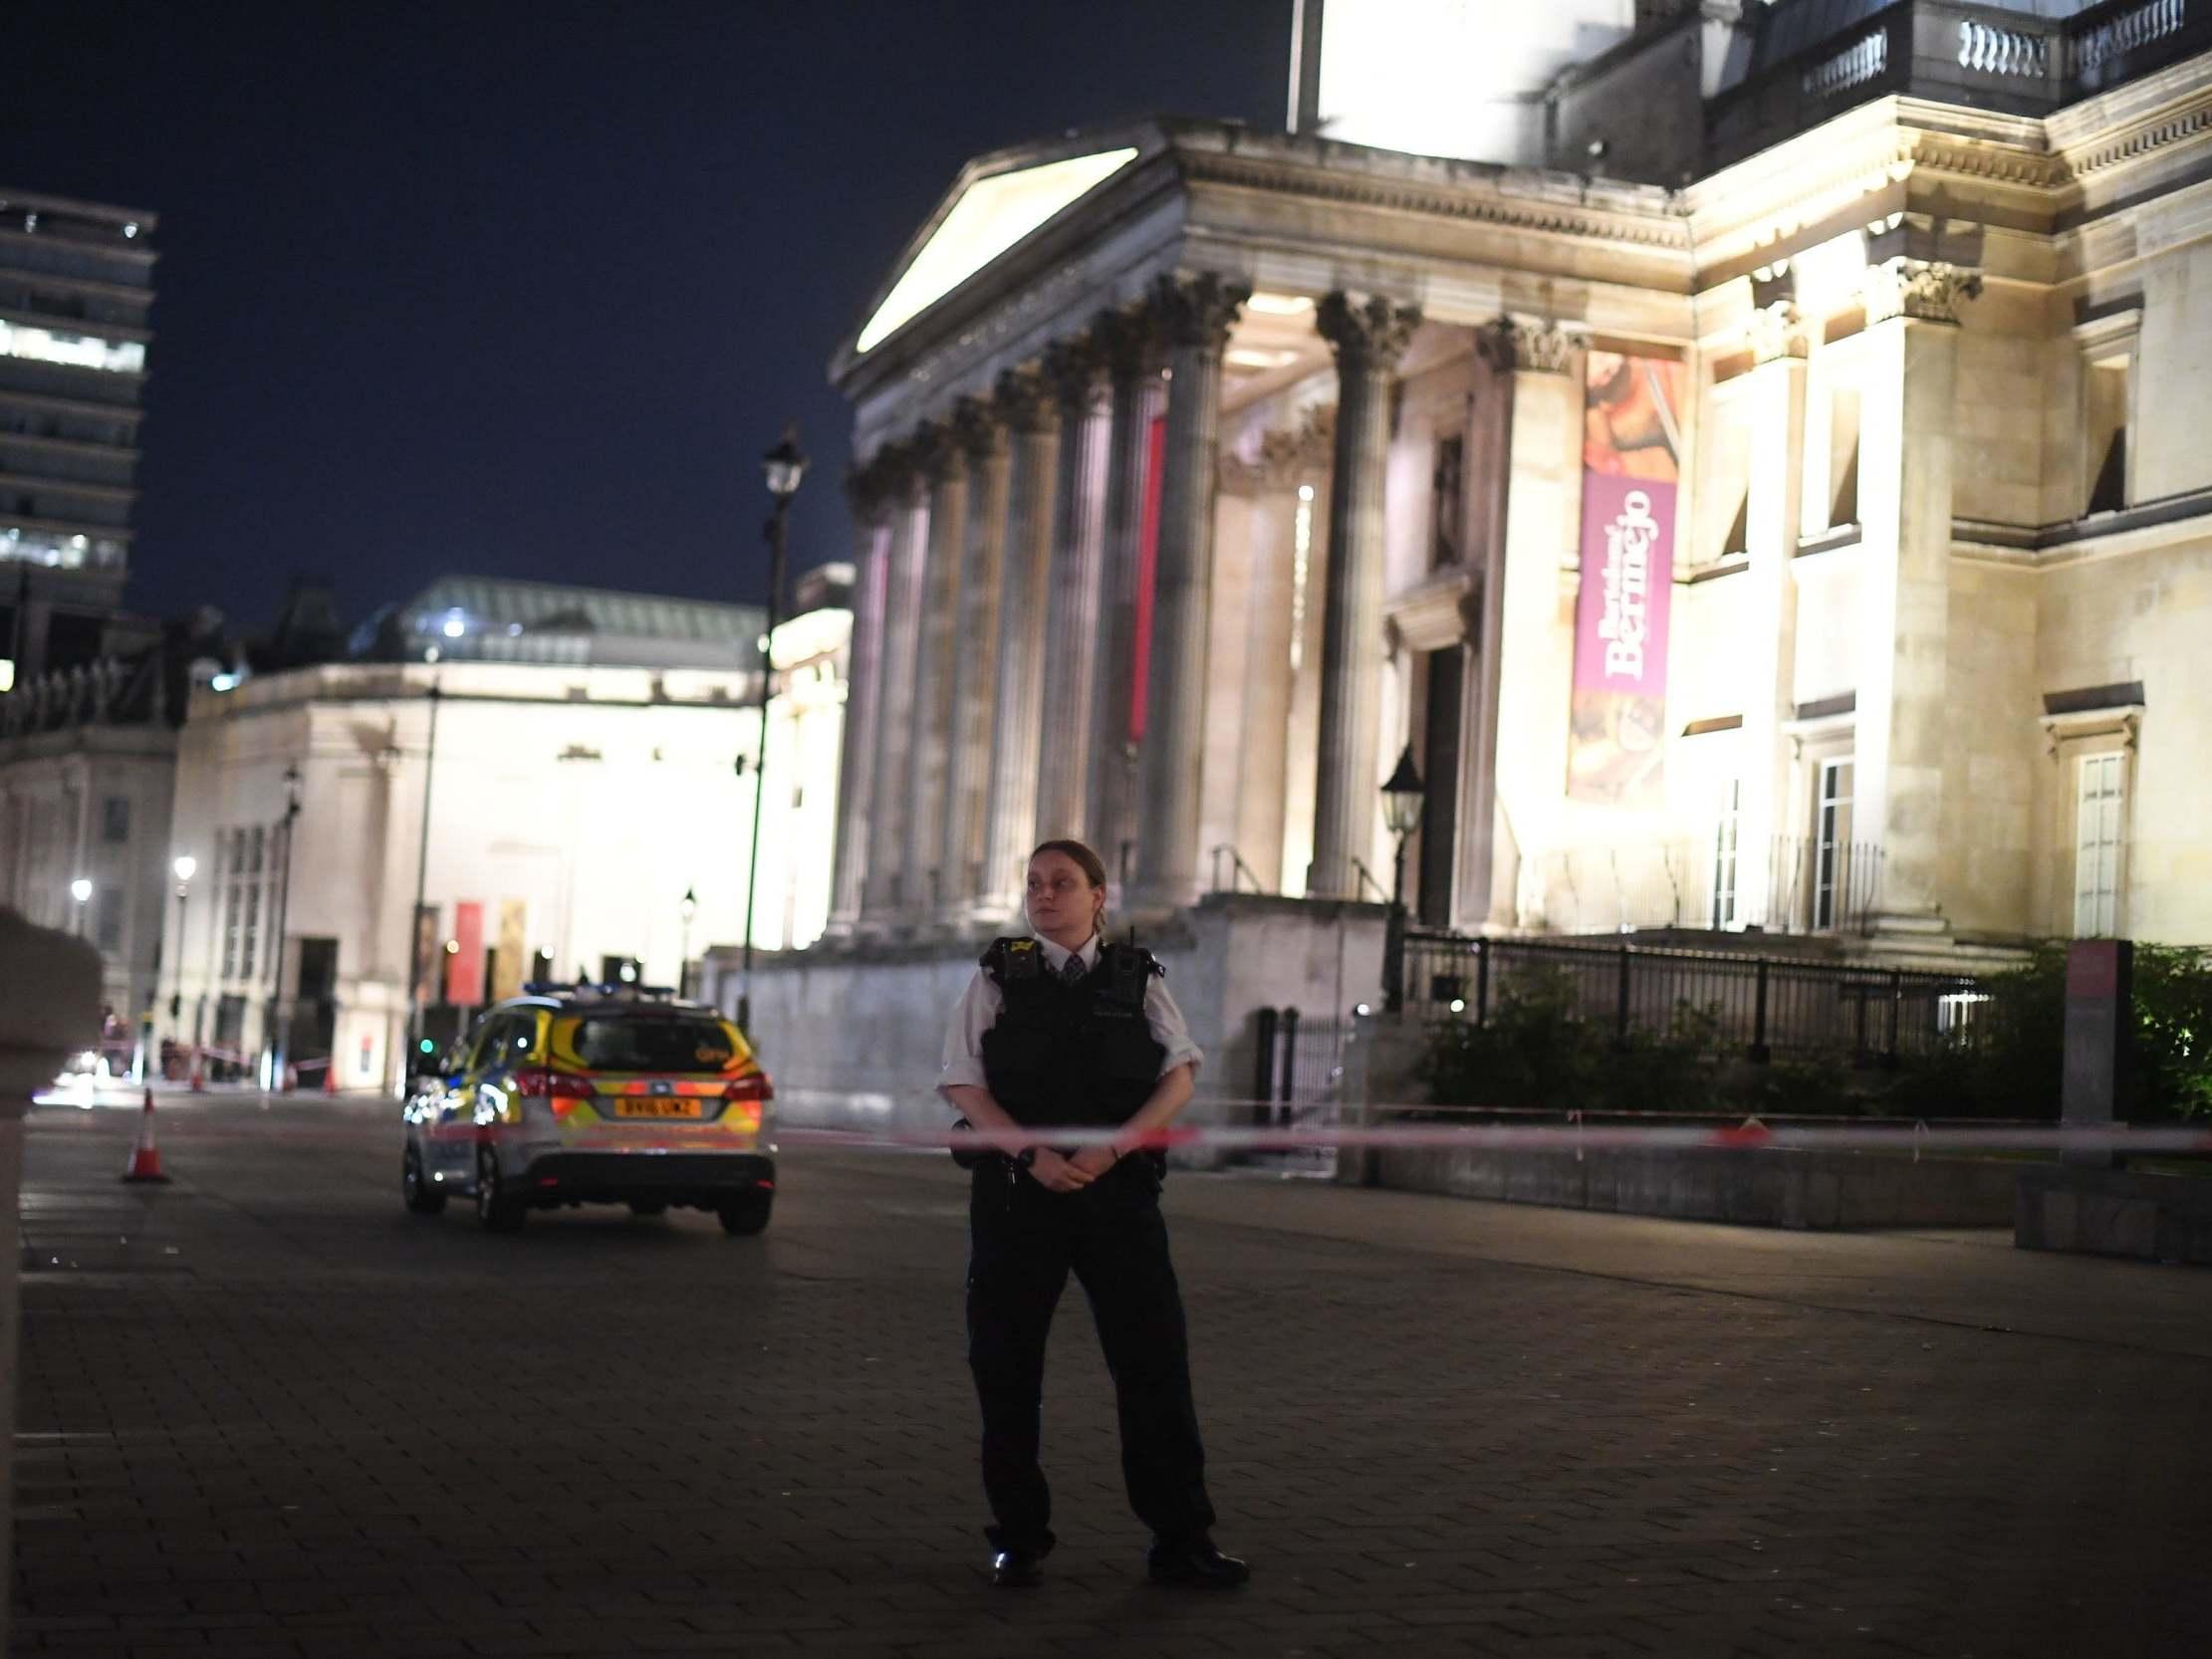 Trafalgar Square stabbing: Metropolitan Police cordon off London tourist hotspot after man knifed